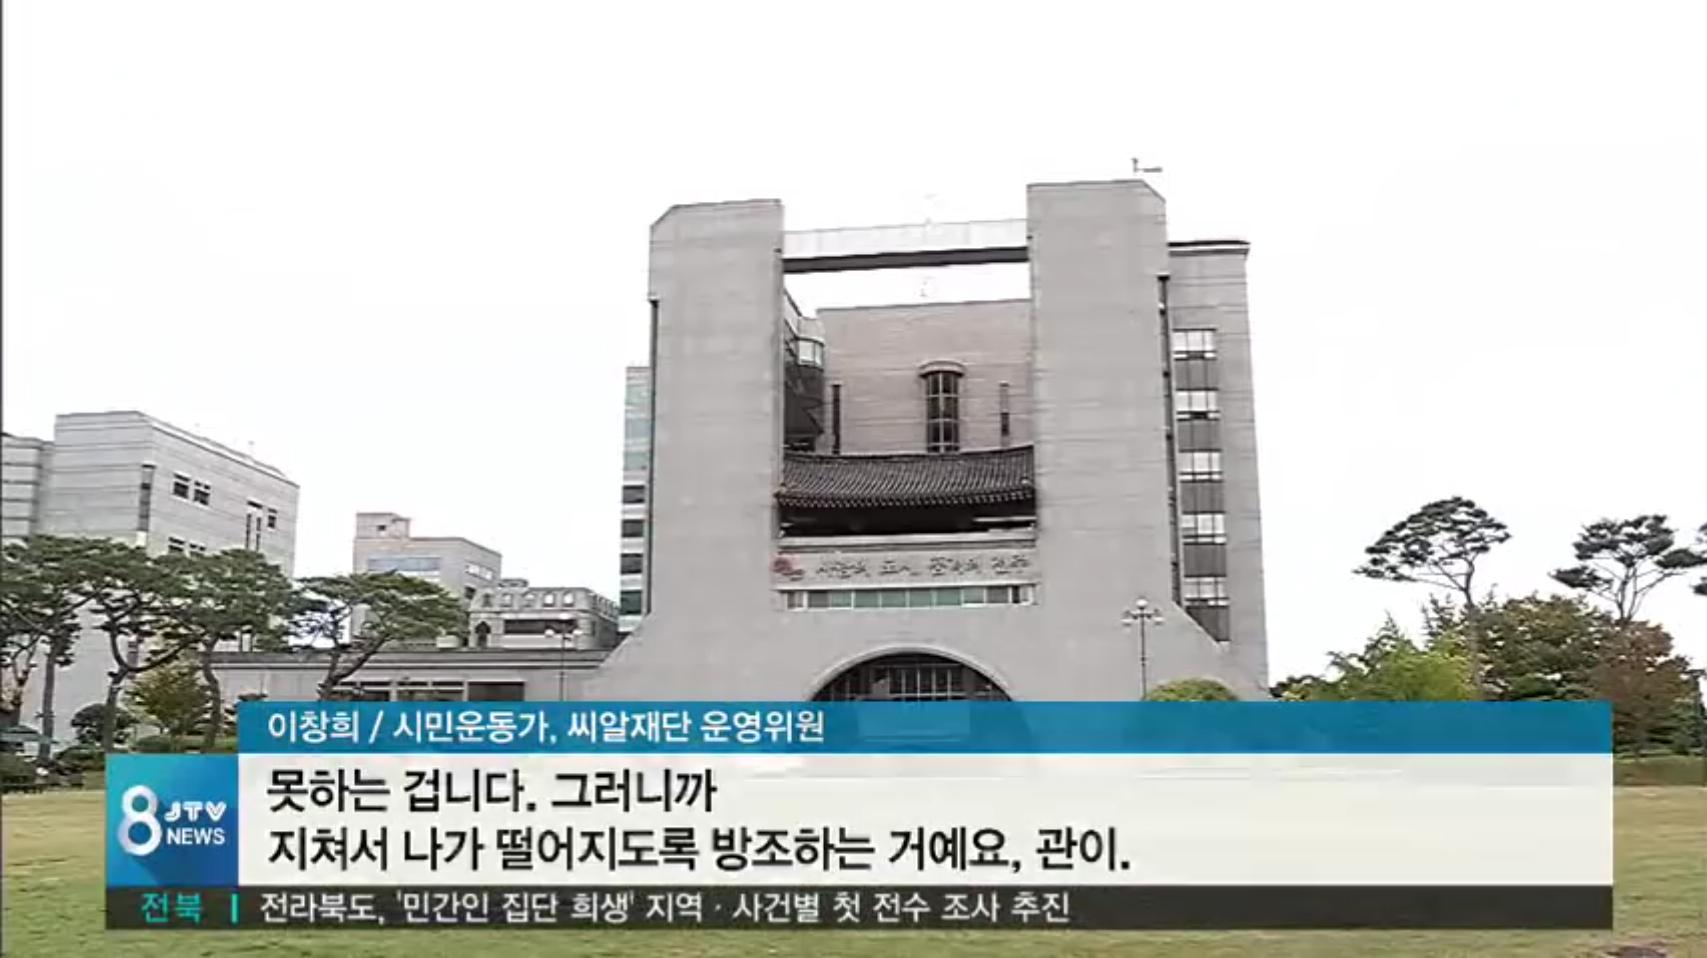 [19.4.25 JTV] 전주시, 정보공개 거부(토지사용승낙서, 국공유지 비율)로 주민은 2년 넘게 소송에 시달려7.png